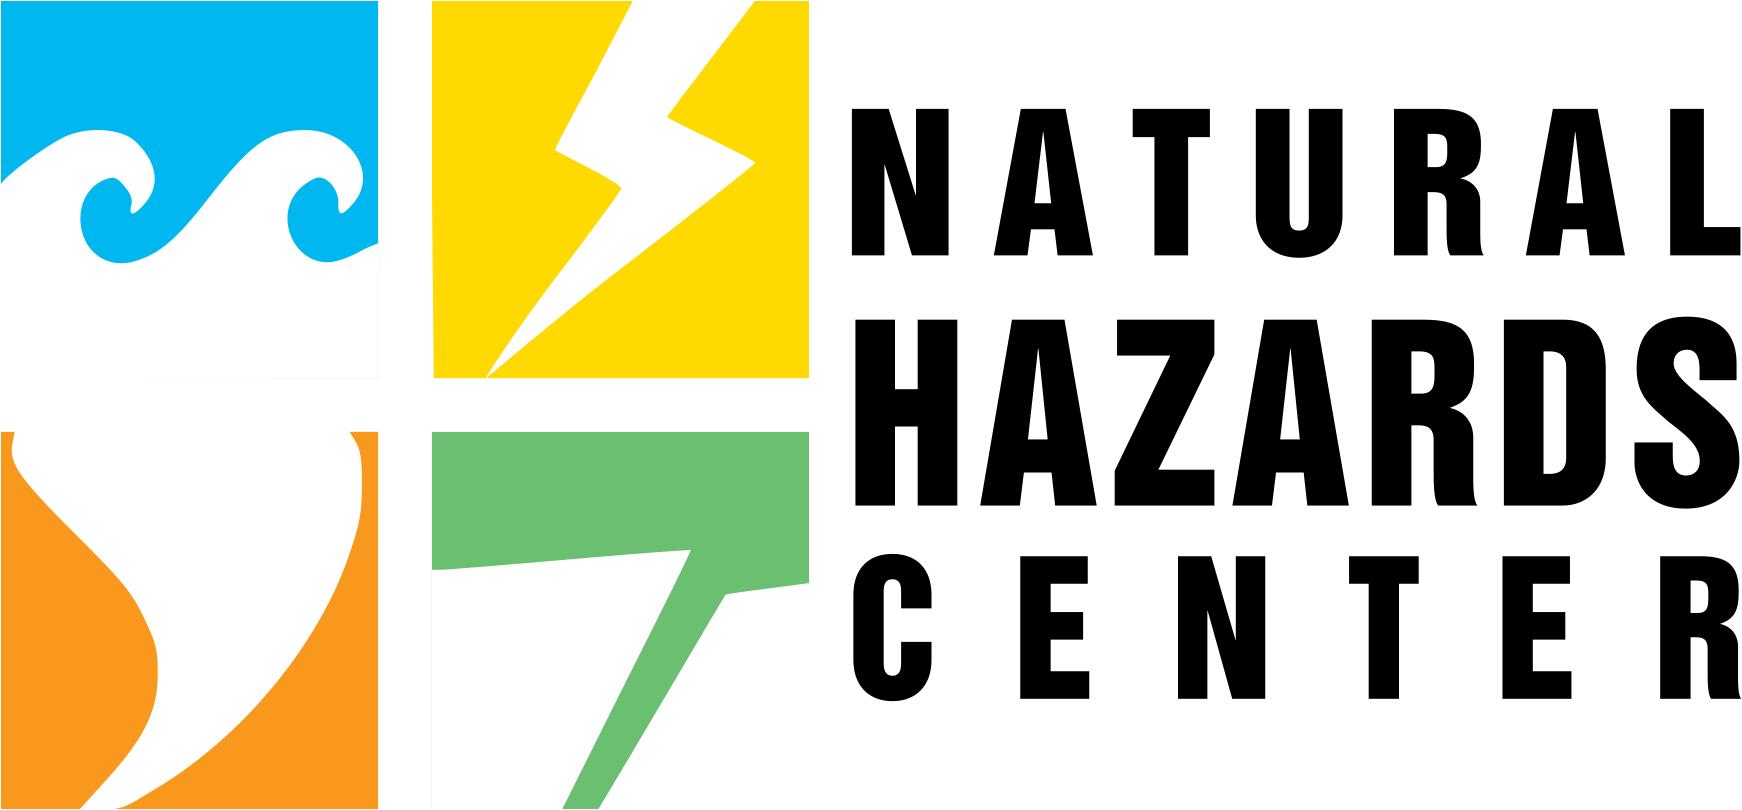 University of Colorado, Boulder Natural Hazards Center